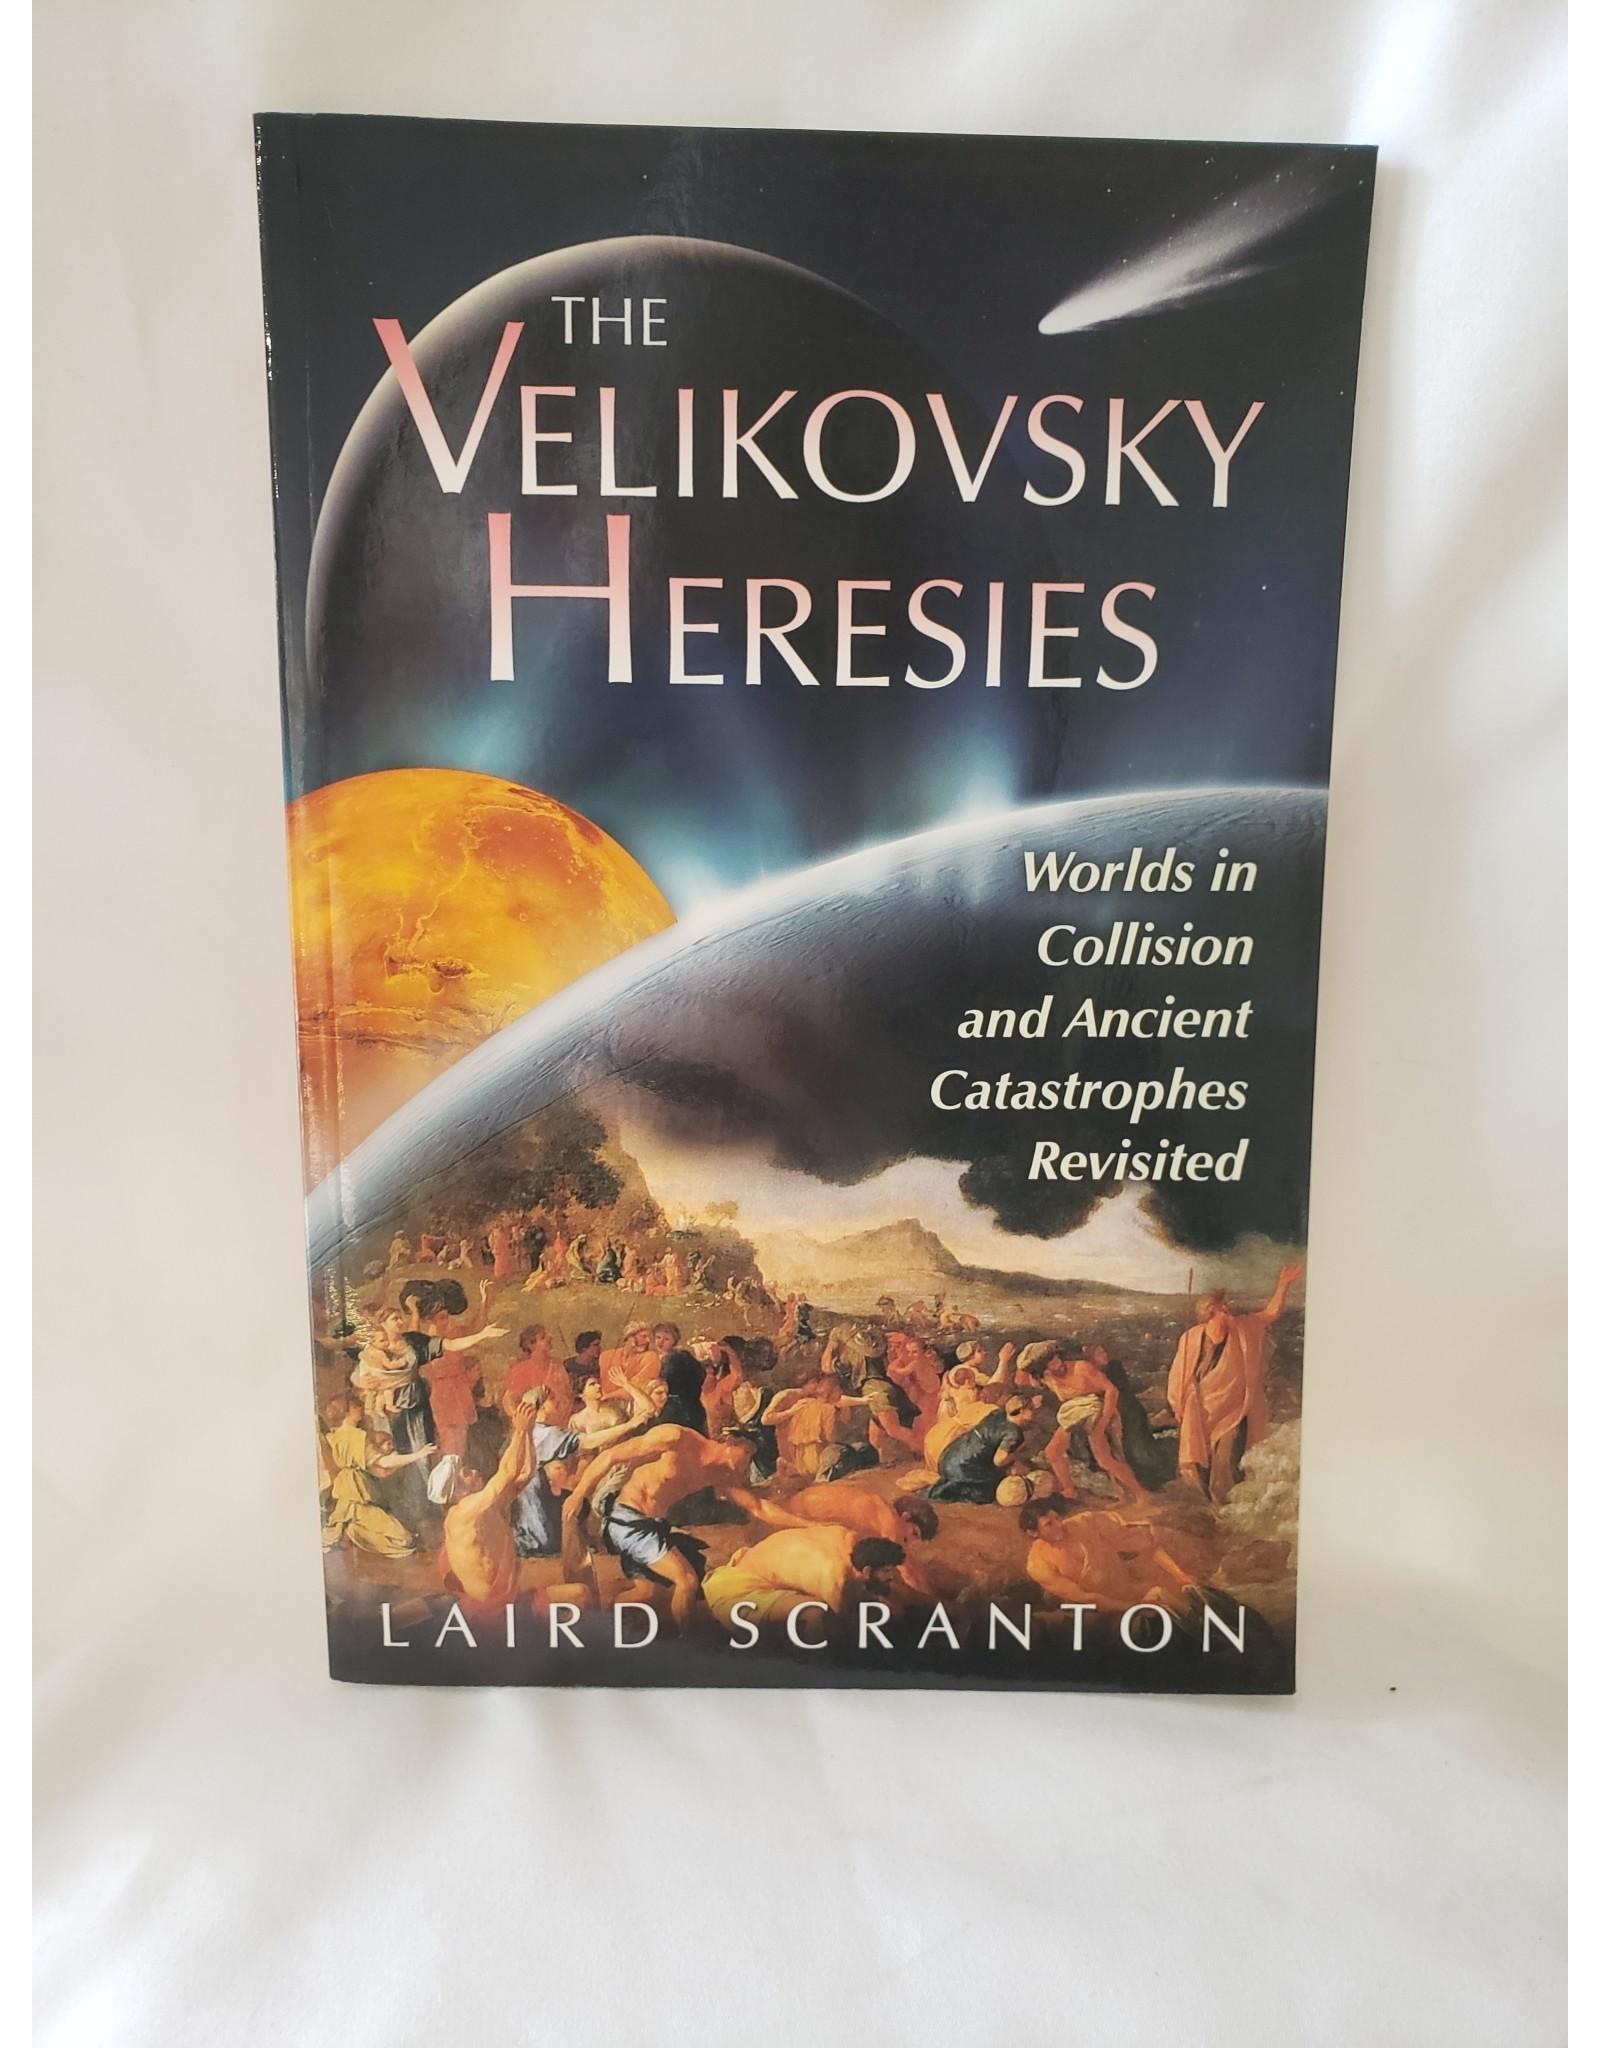 The Velikovsky Heresies by Laird Scranton